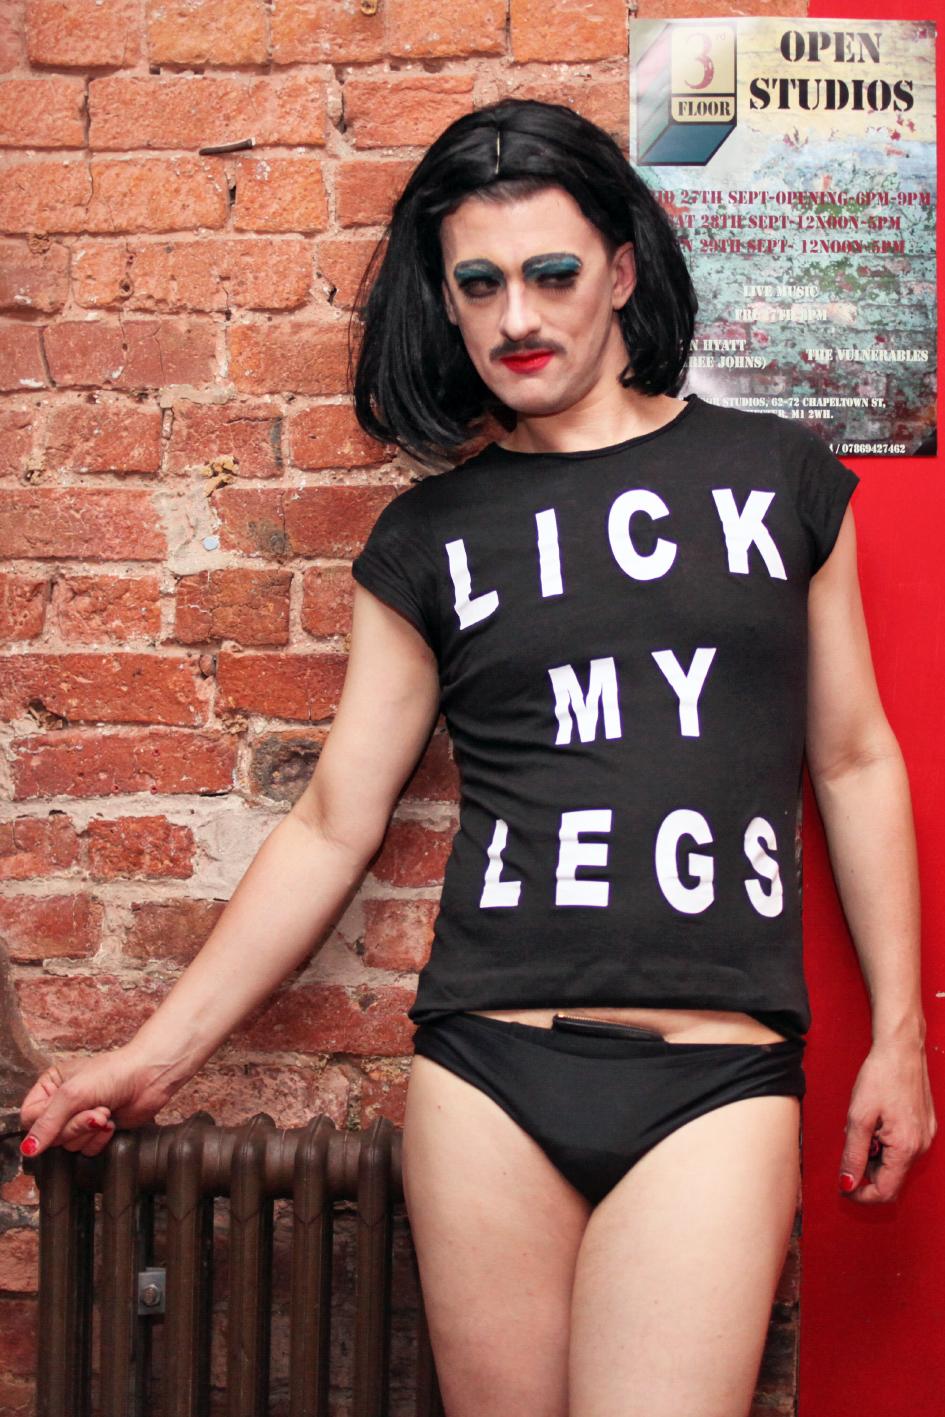 Lick my Legs